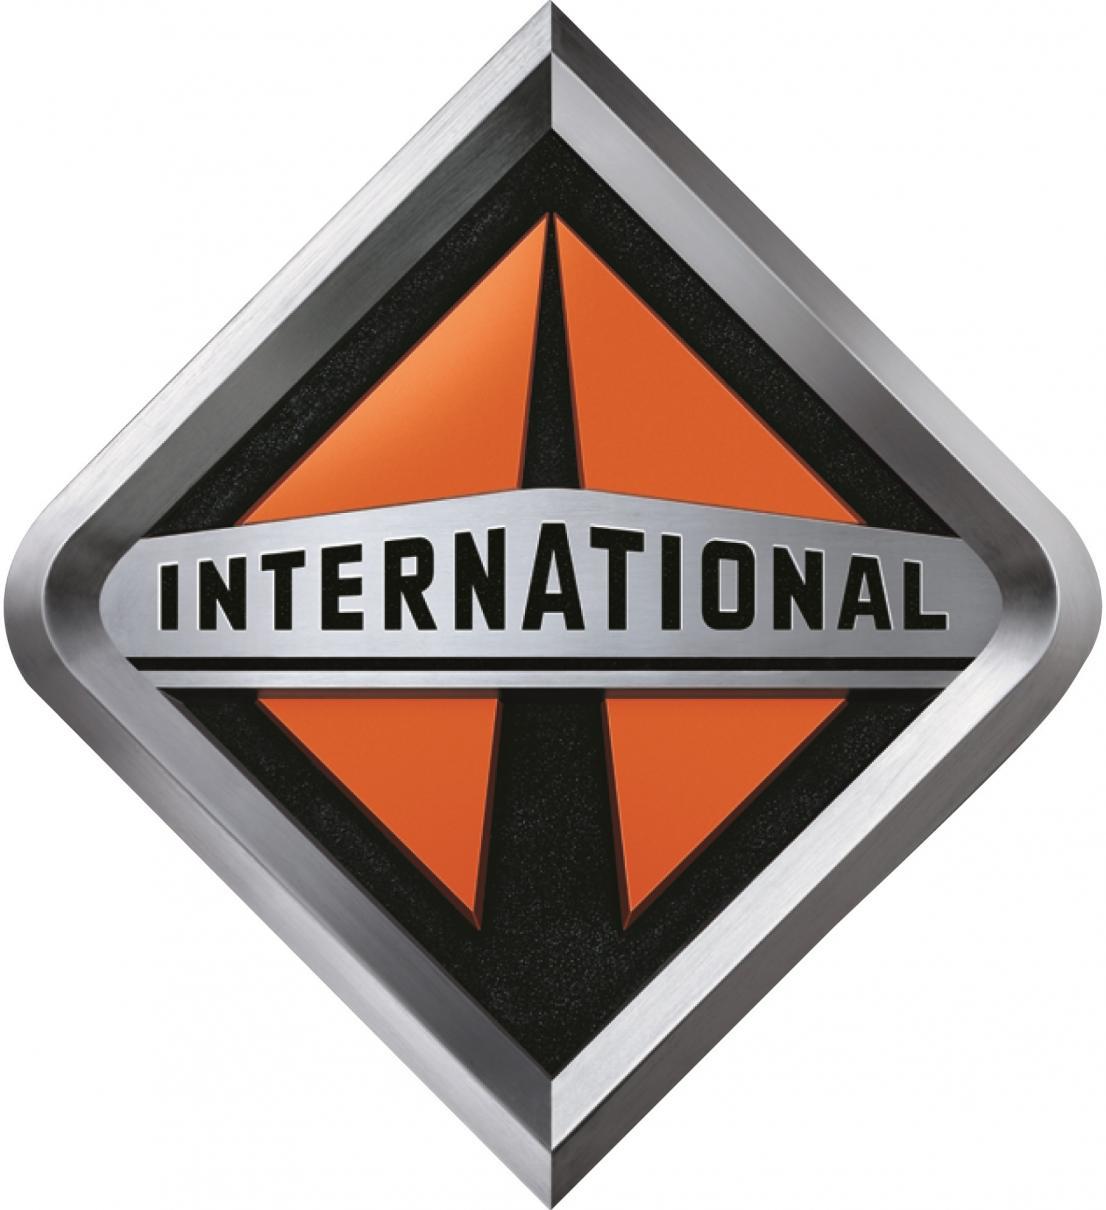 Nelson International is now Diamond Edge Certified